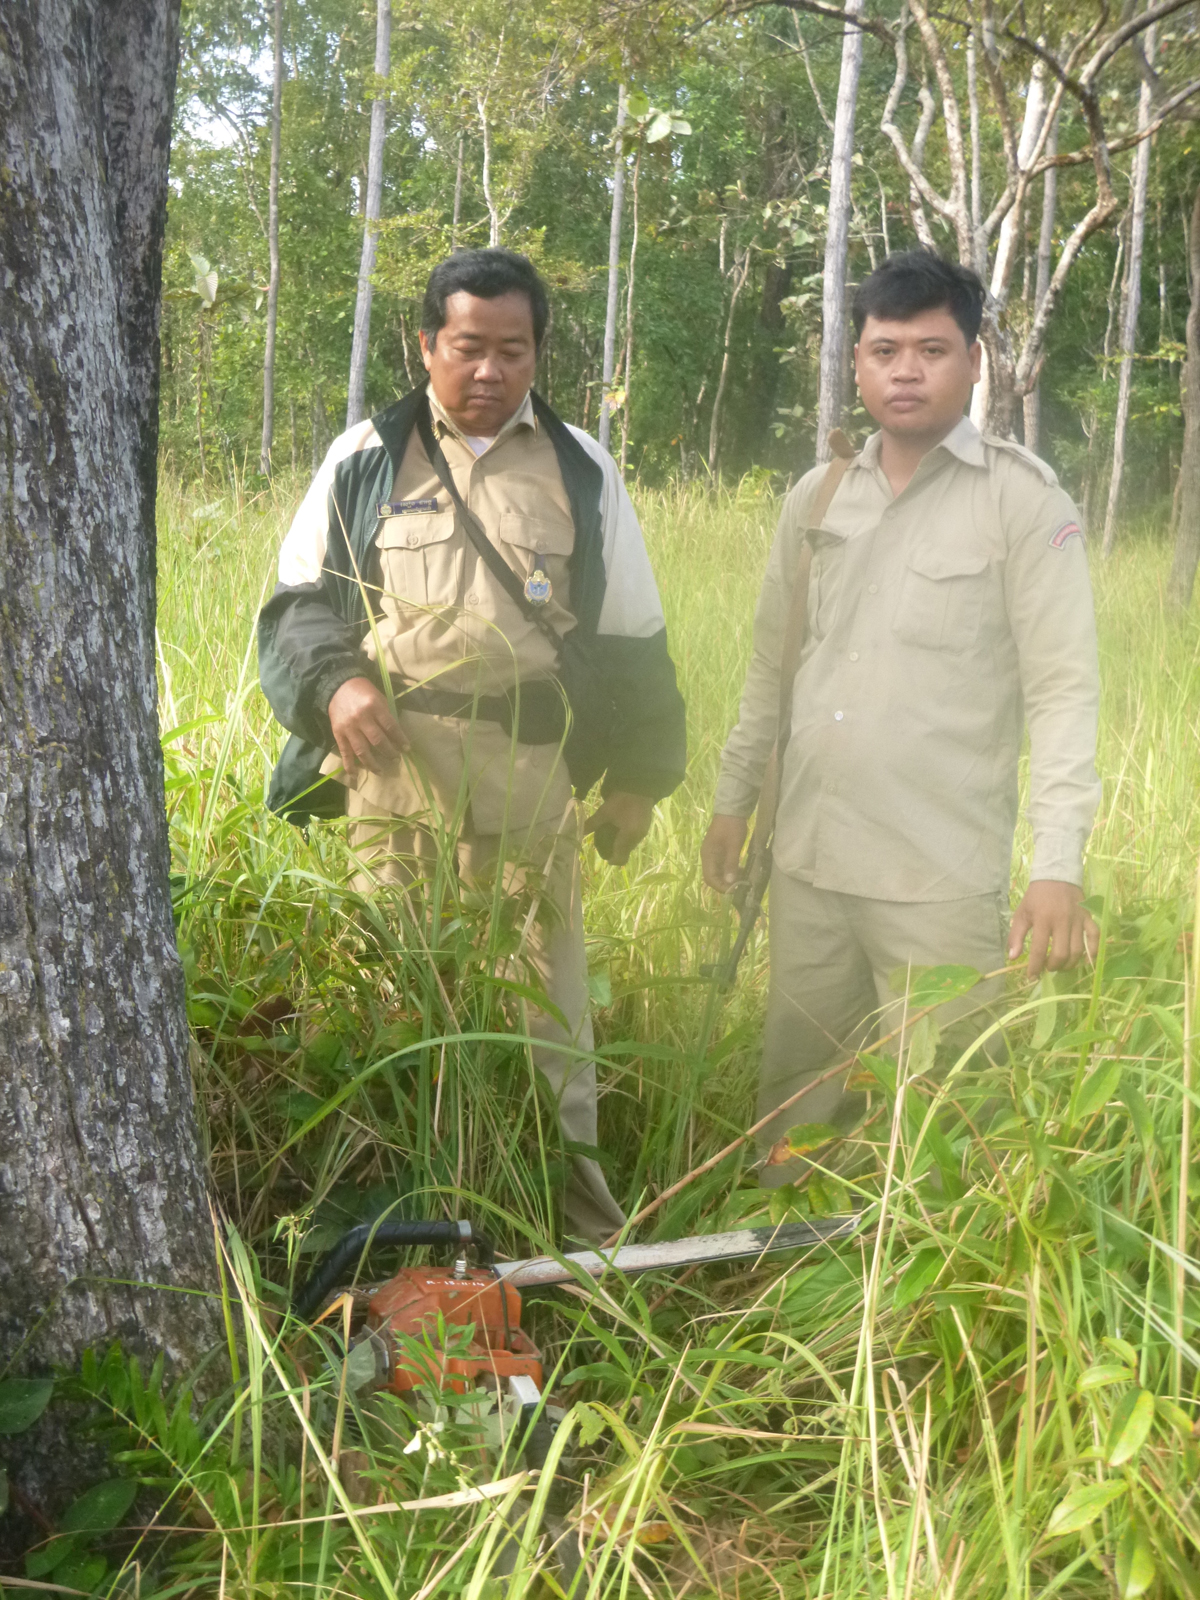 Sieng Darong FA Patrol Leader and Sab Yoh District Police patrol member